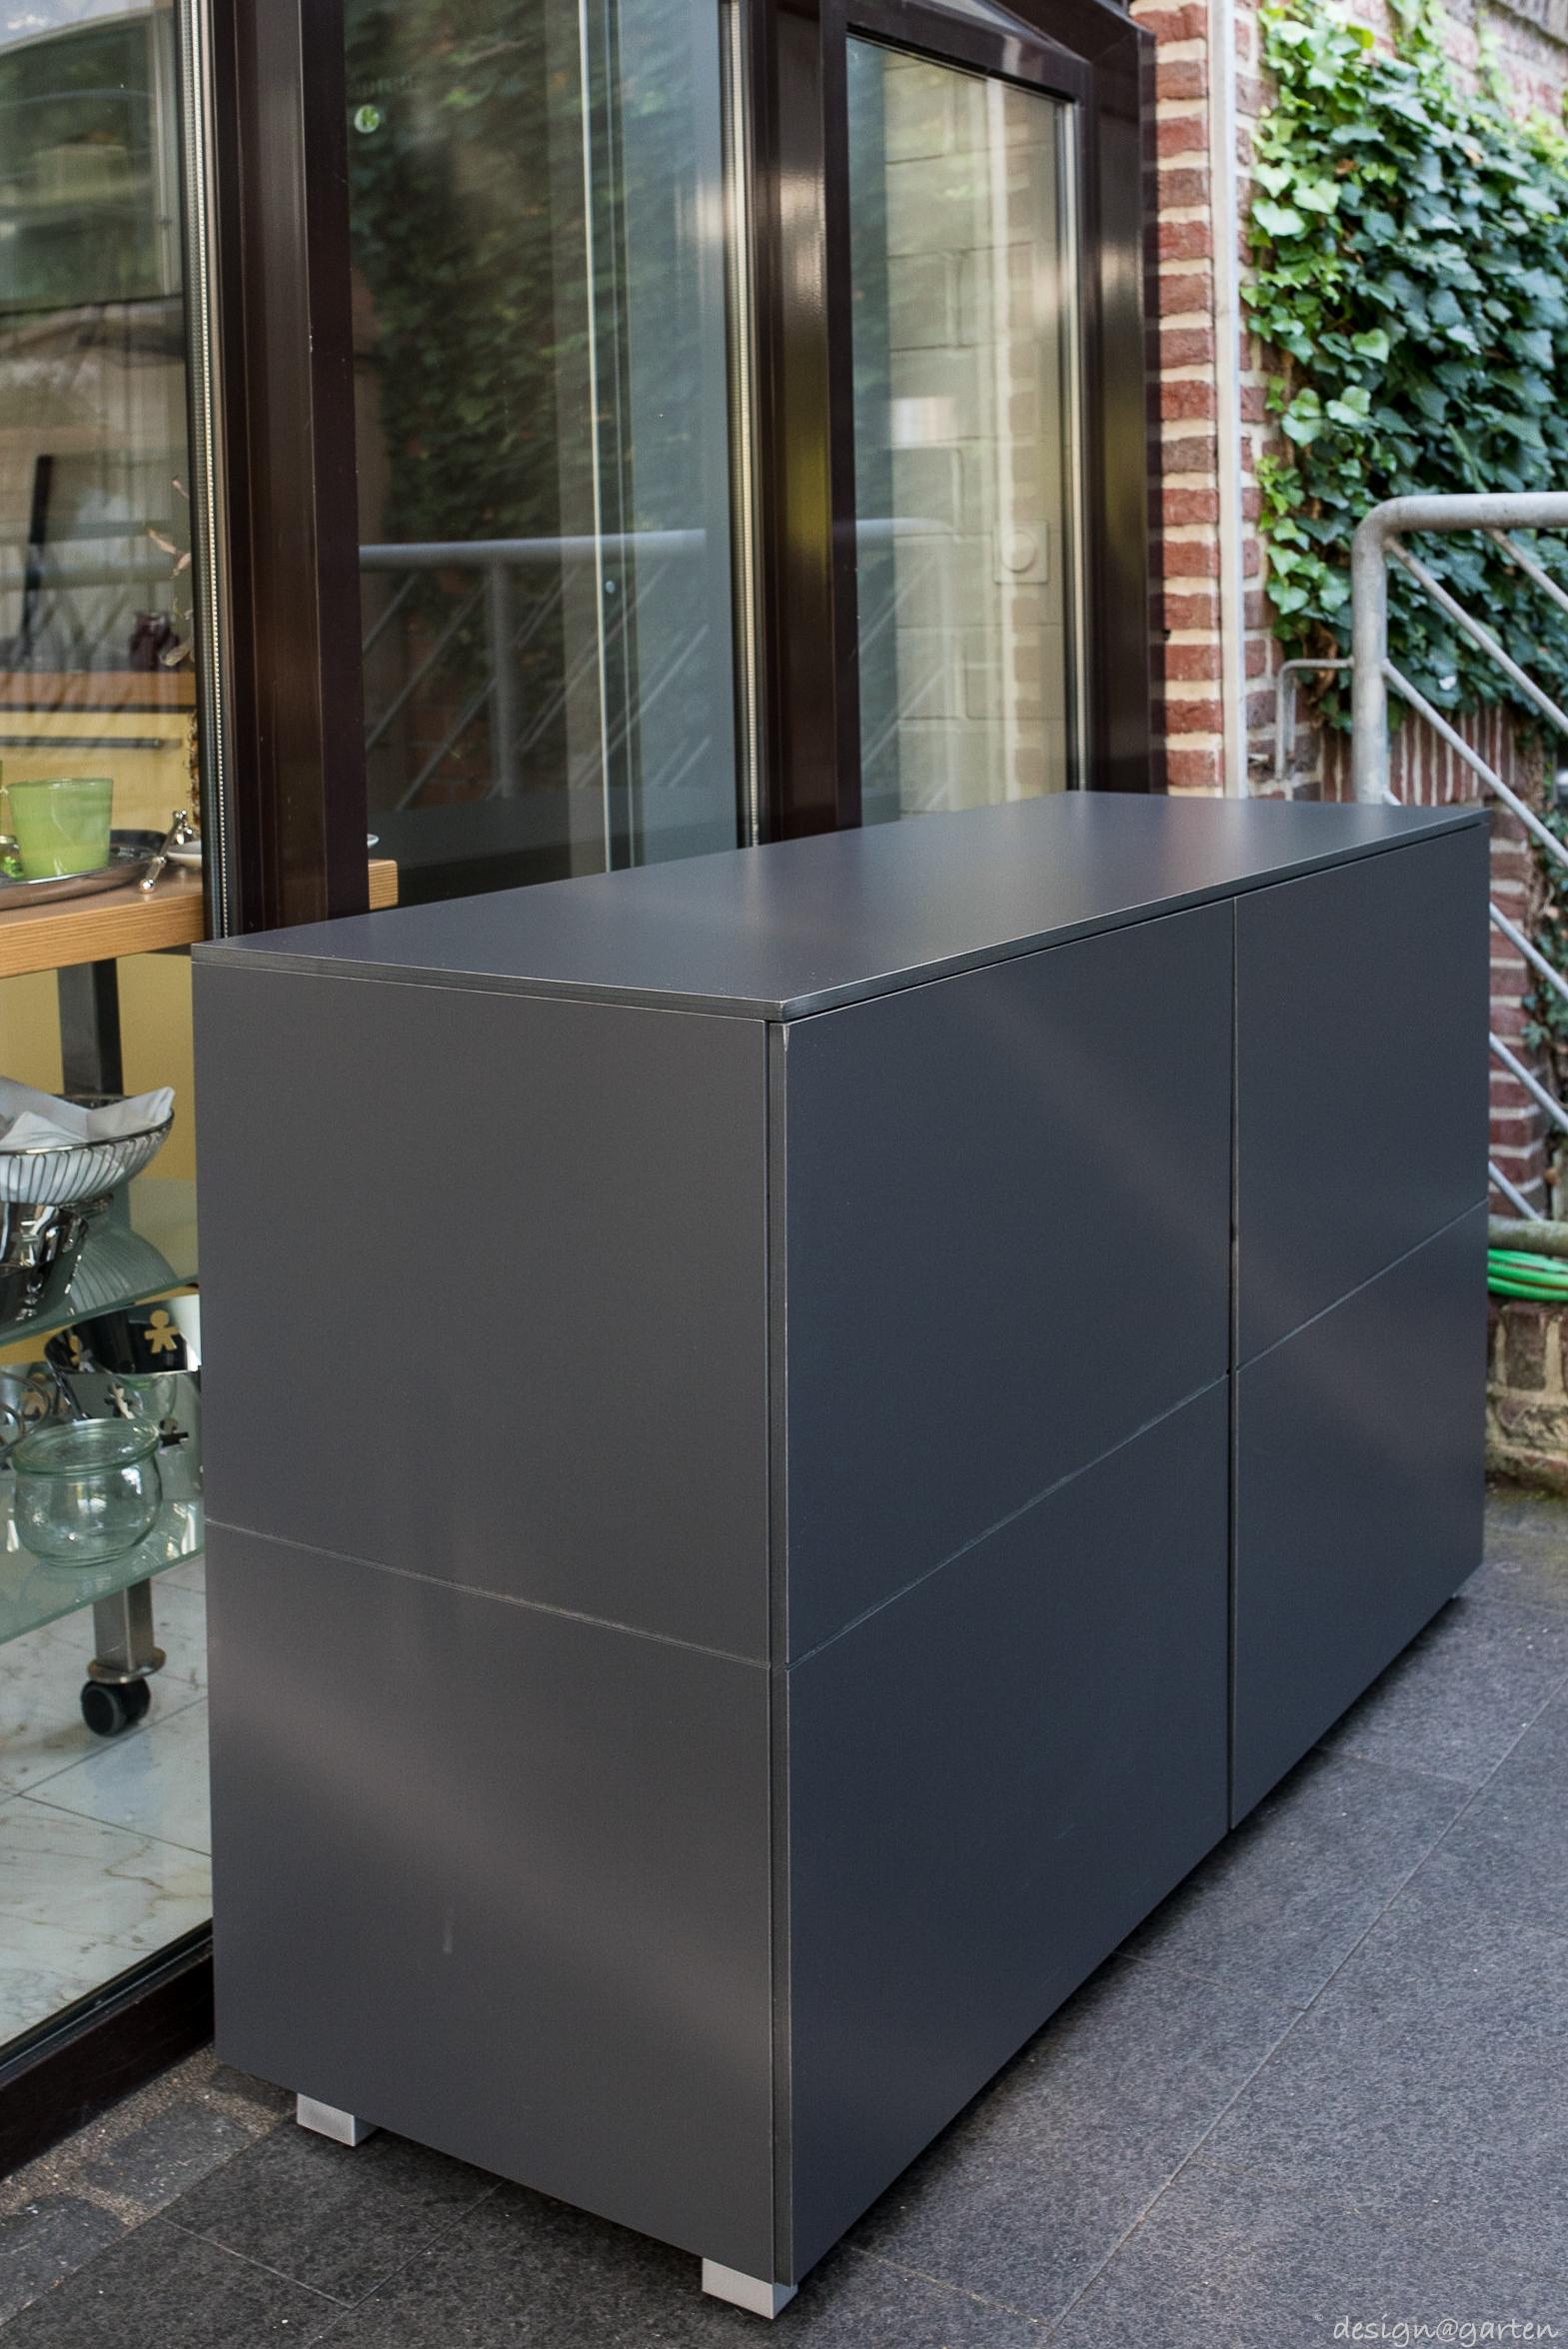 HPL Balkonschrank / Sideboard L 20 in 20 Emsdetten   designgarten